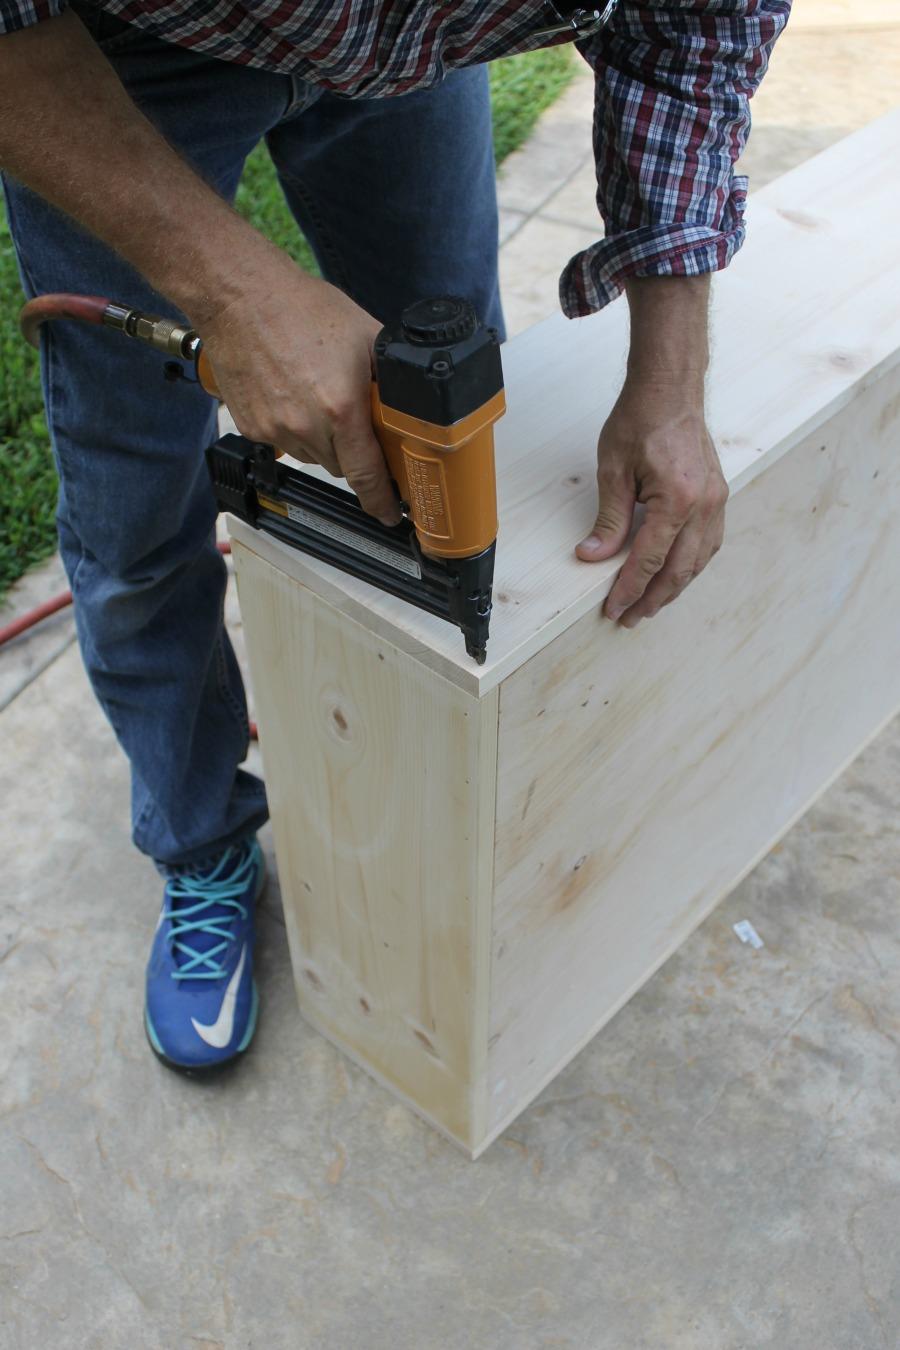 Under Bed Storage DIY Drawer How To - Nail Gun Step 4